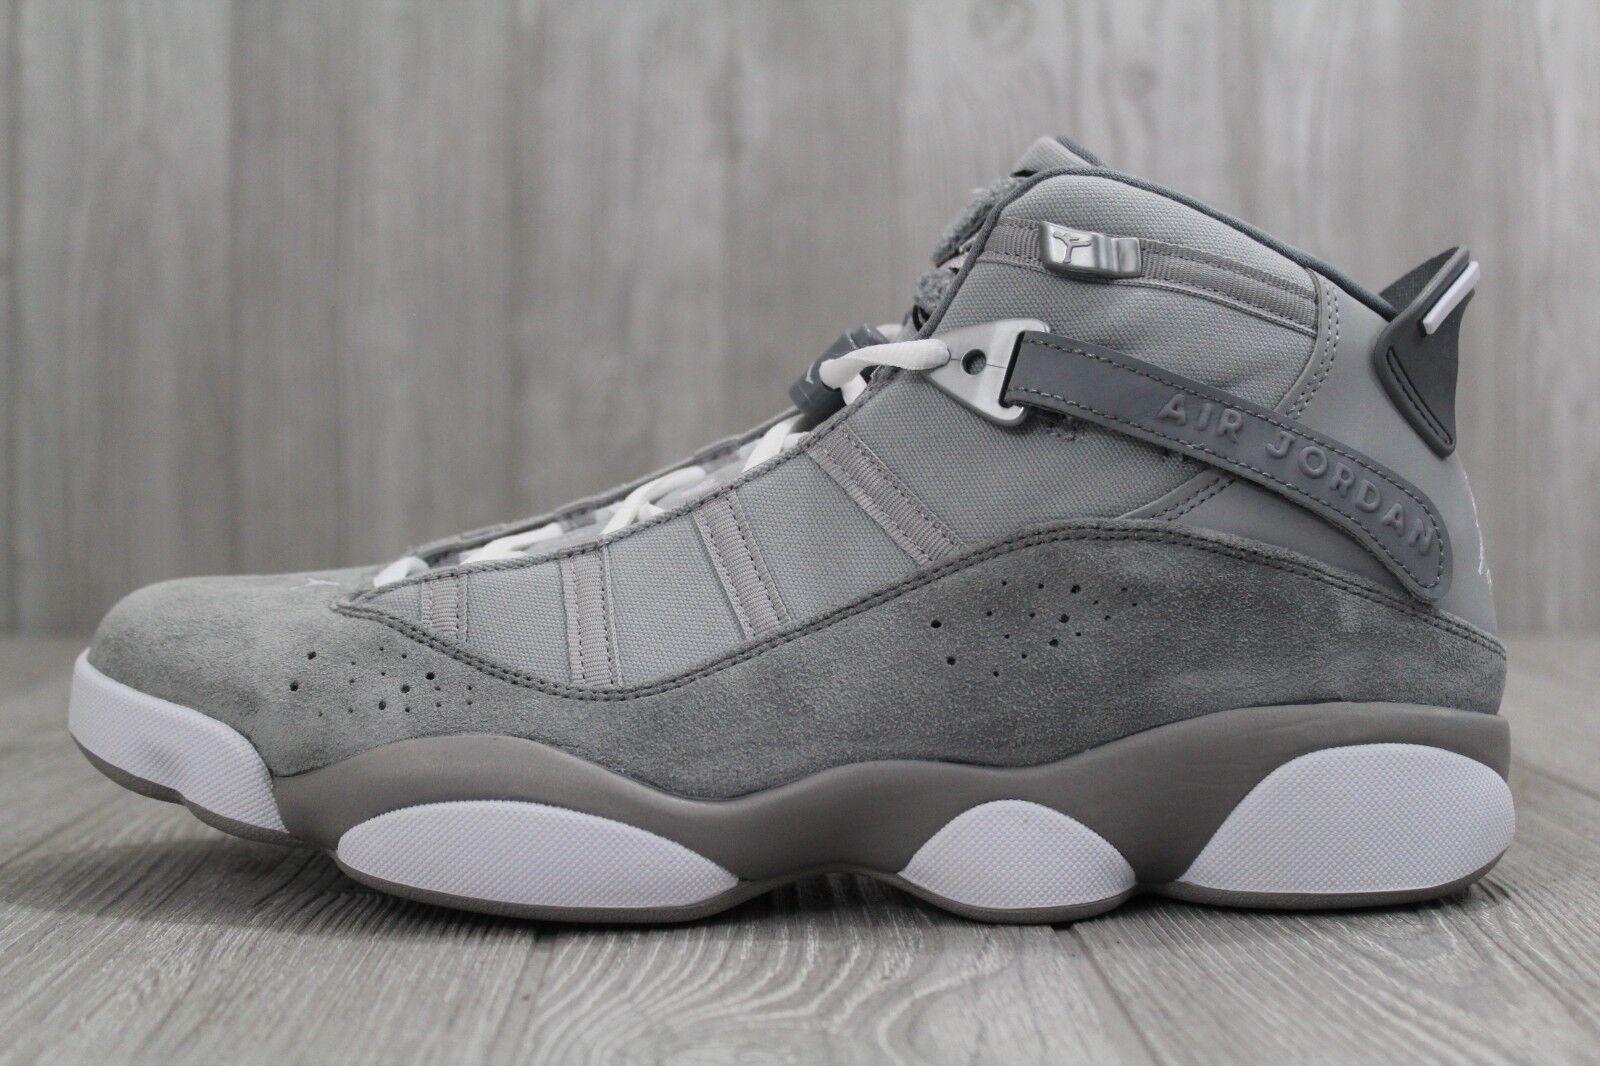 33 Nike Air Jordan 6 Rings Basketball Shoes Matte Silver Size 9.5- 13 322992 014